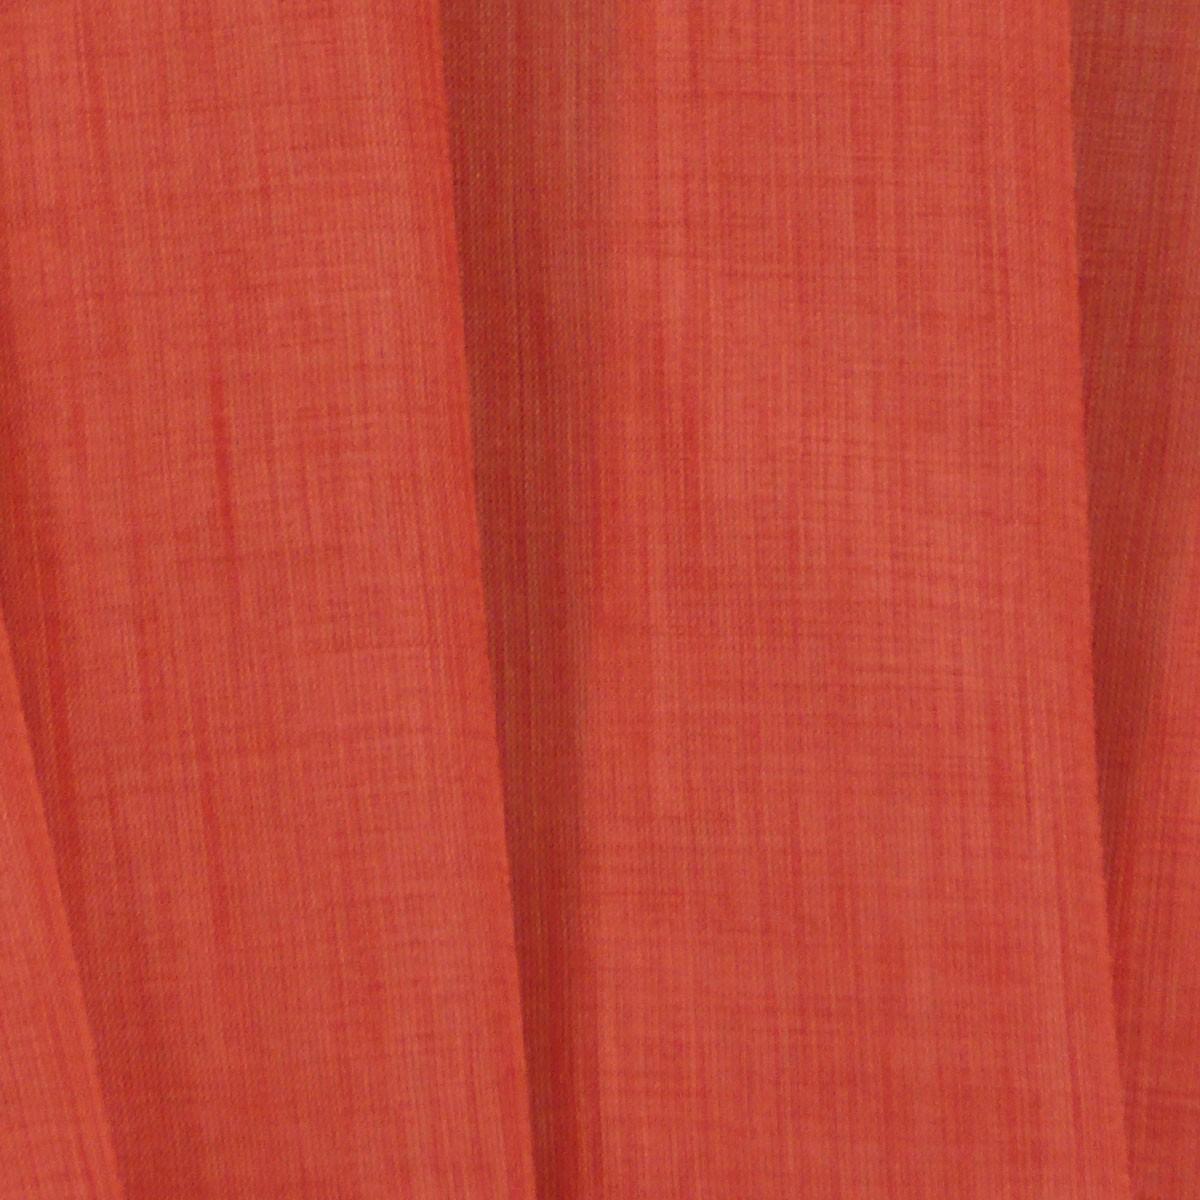 gardinen stoff meterware ambiente leinenoptik terrakotta. Black Bedroom Furniture Sets. Home Design Ideas